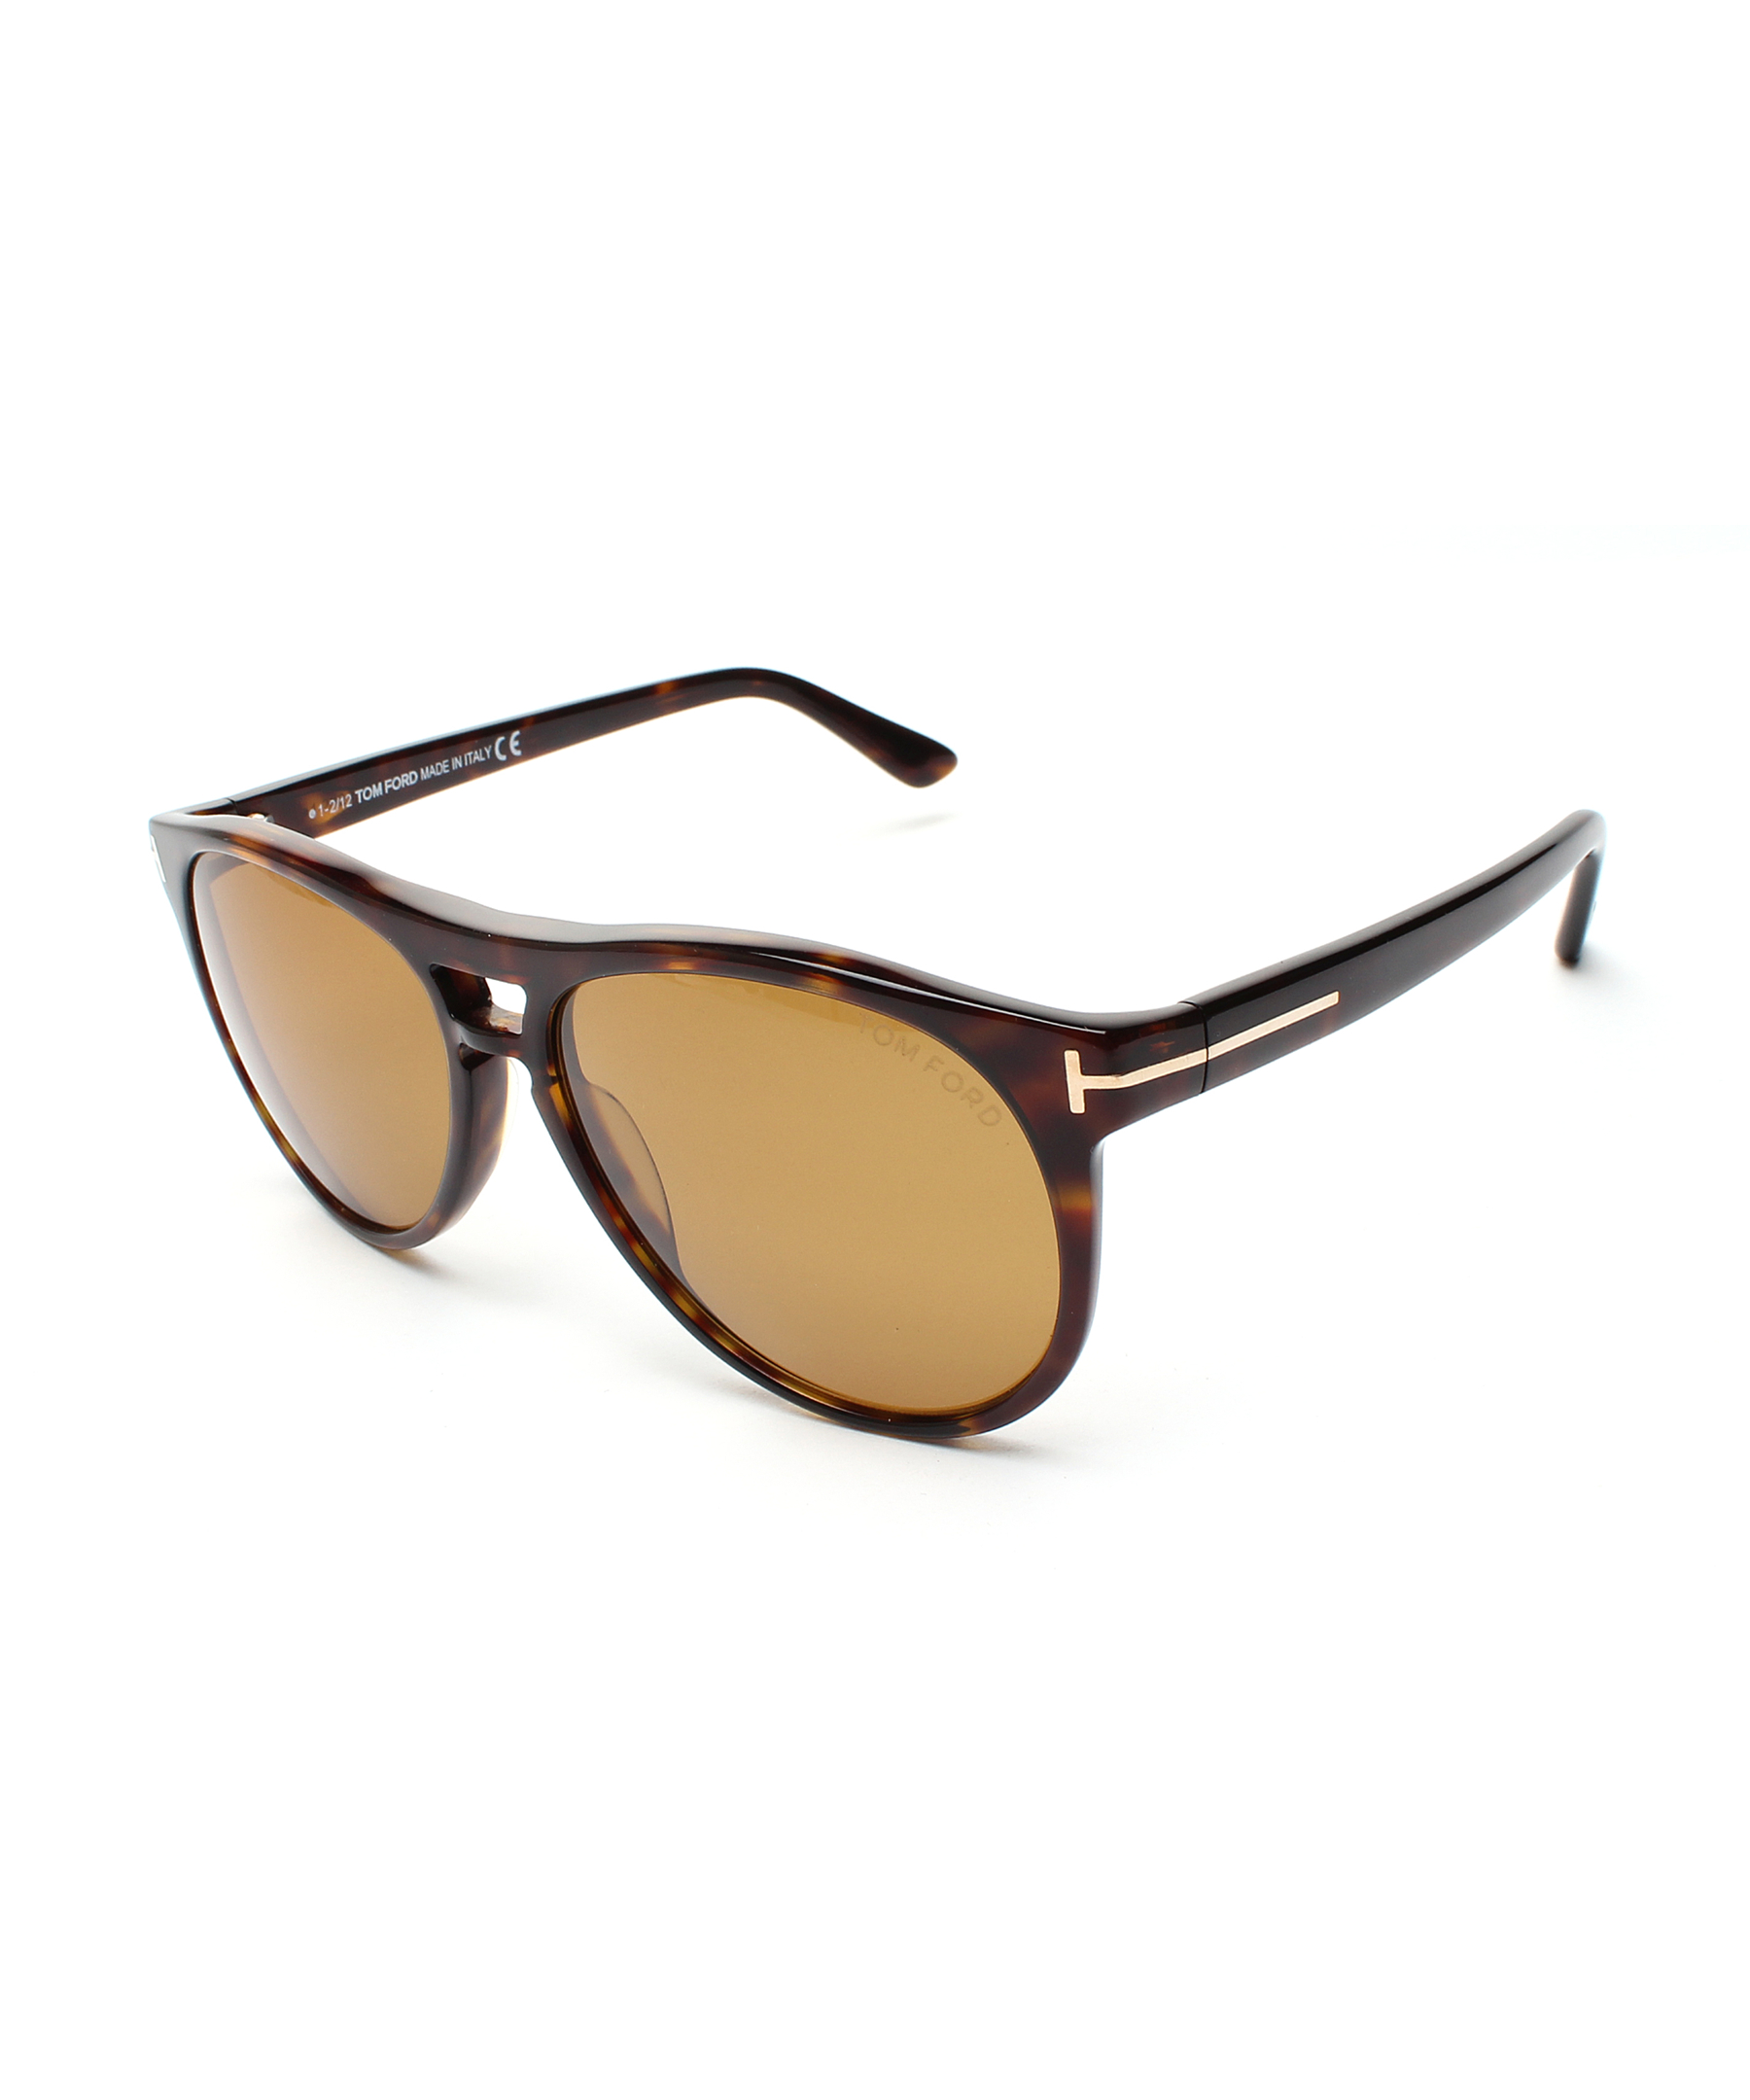 03498b6516569 Lyst - Tom Ford Callum Sunglasses in Brown for Men